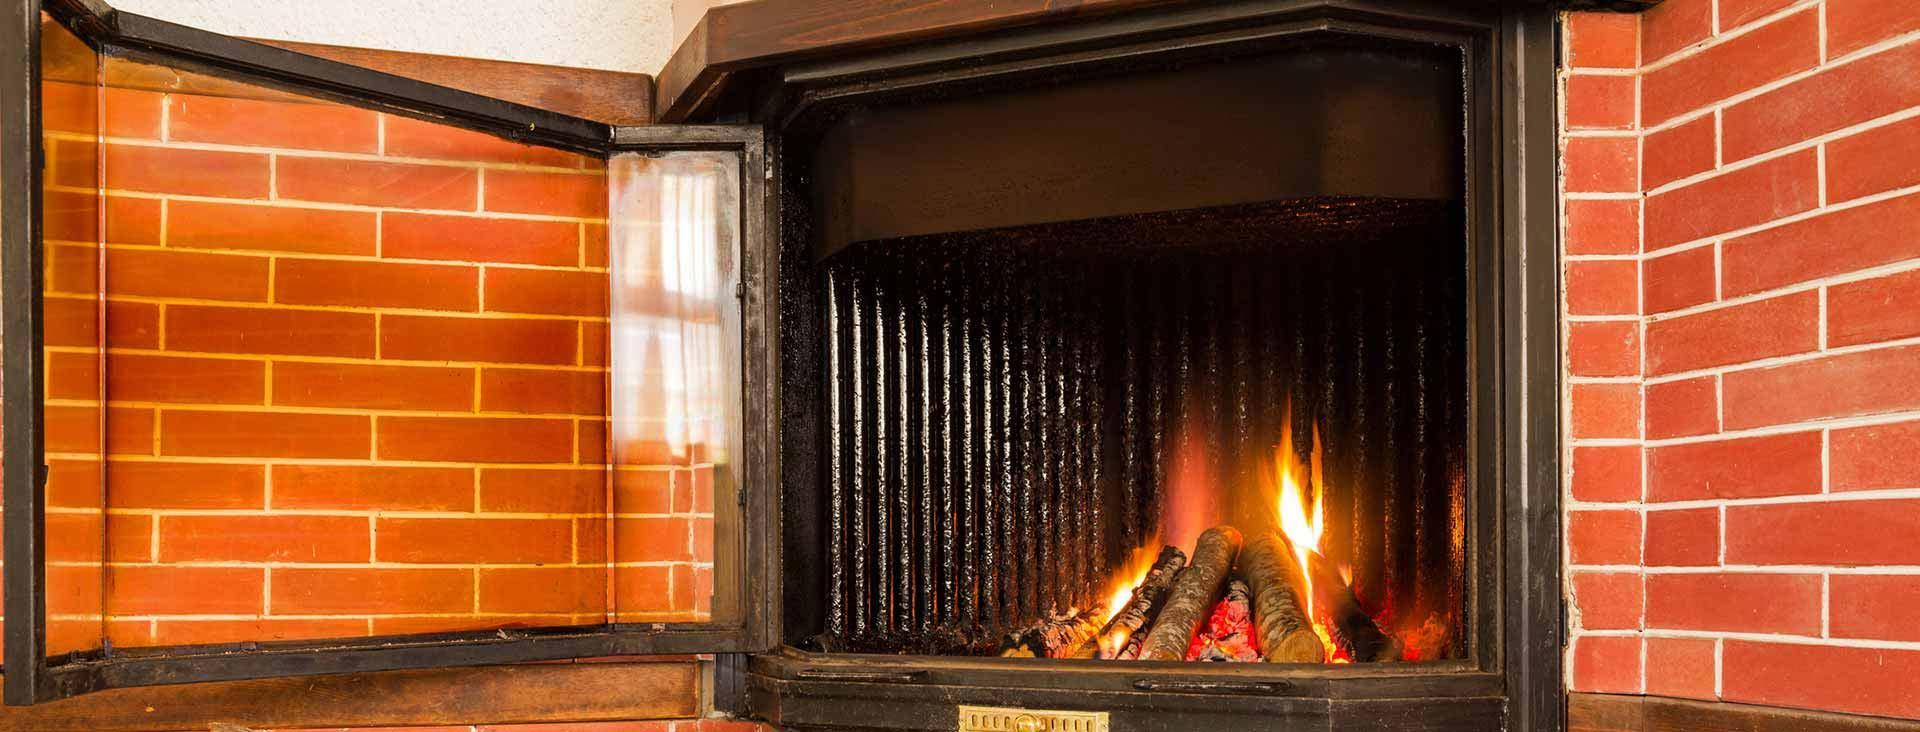 Air Express Heating & Air Conditioning image 16